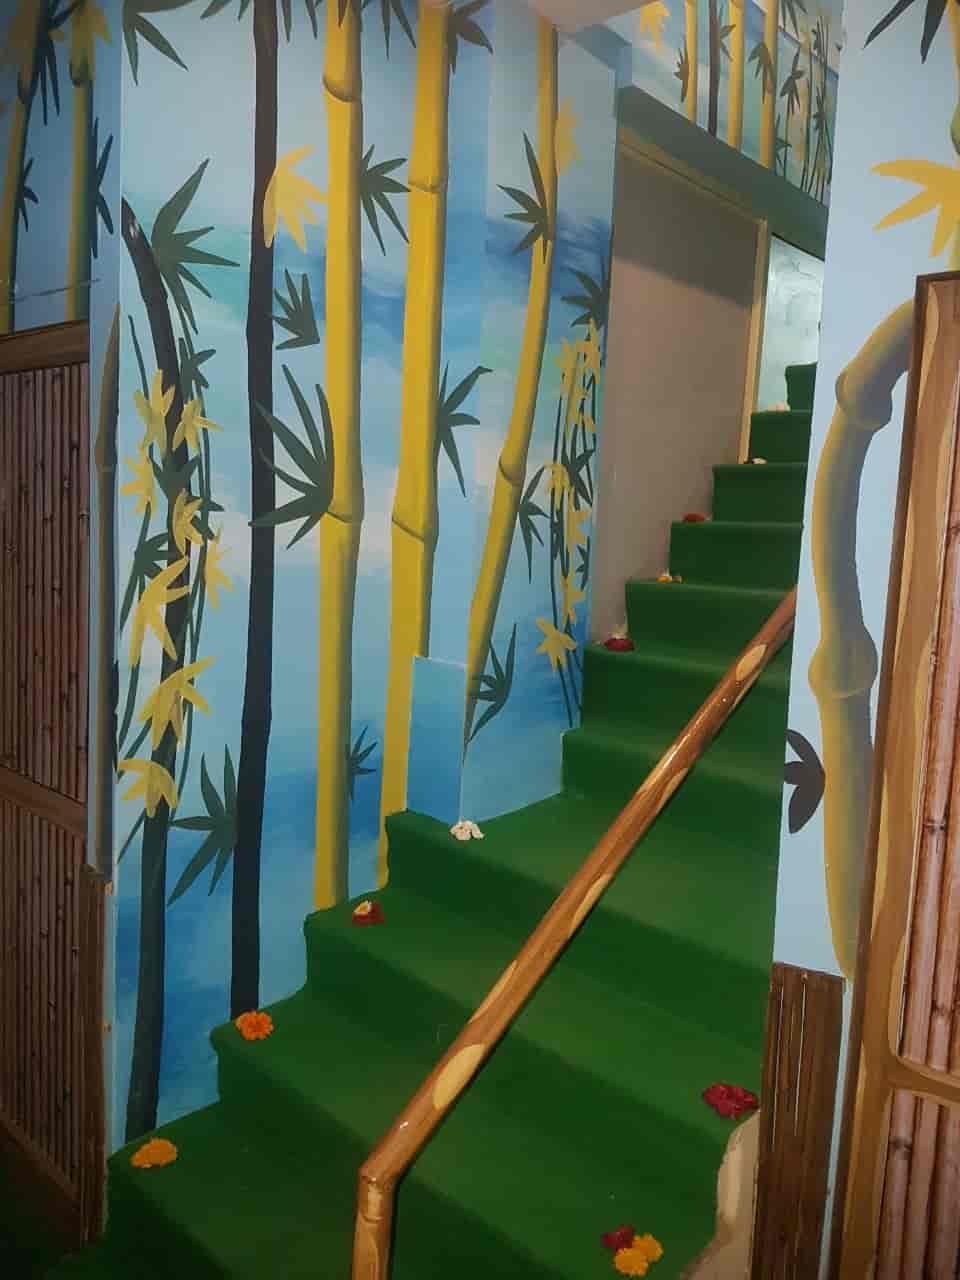 Bell Tent Spa Vaishali Nagar - Body Massage Centres in Jaipur - Justdial & Bell Tent Spa Vaishali Nagar - Body Massage Centres in Jaipur ...